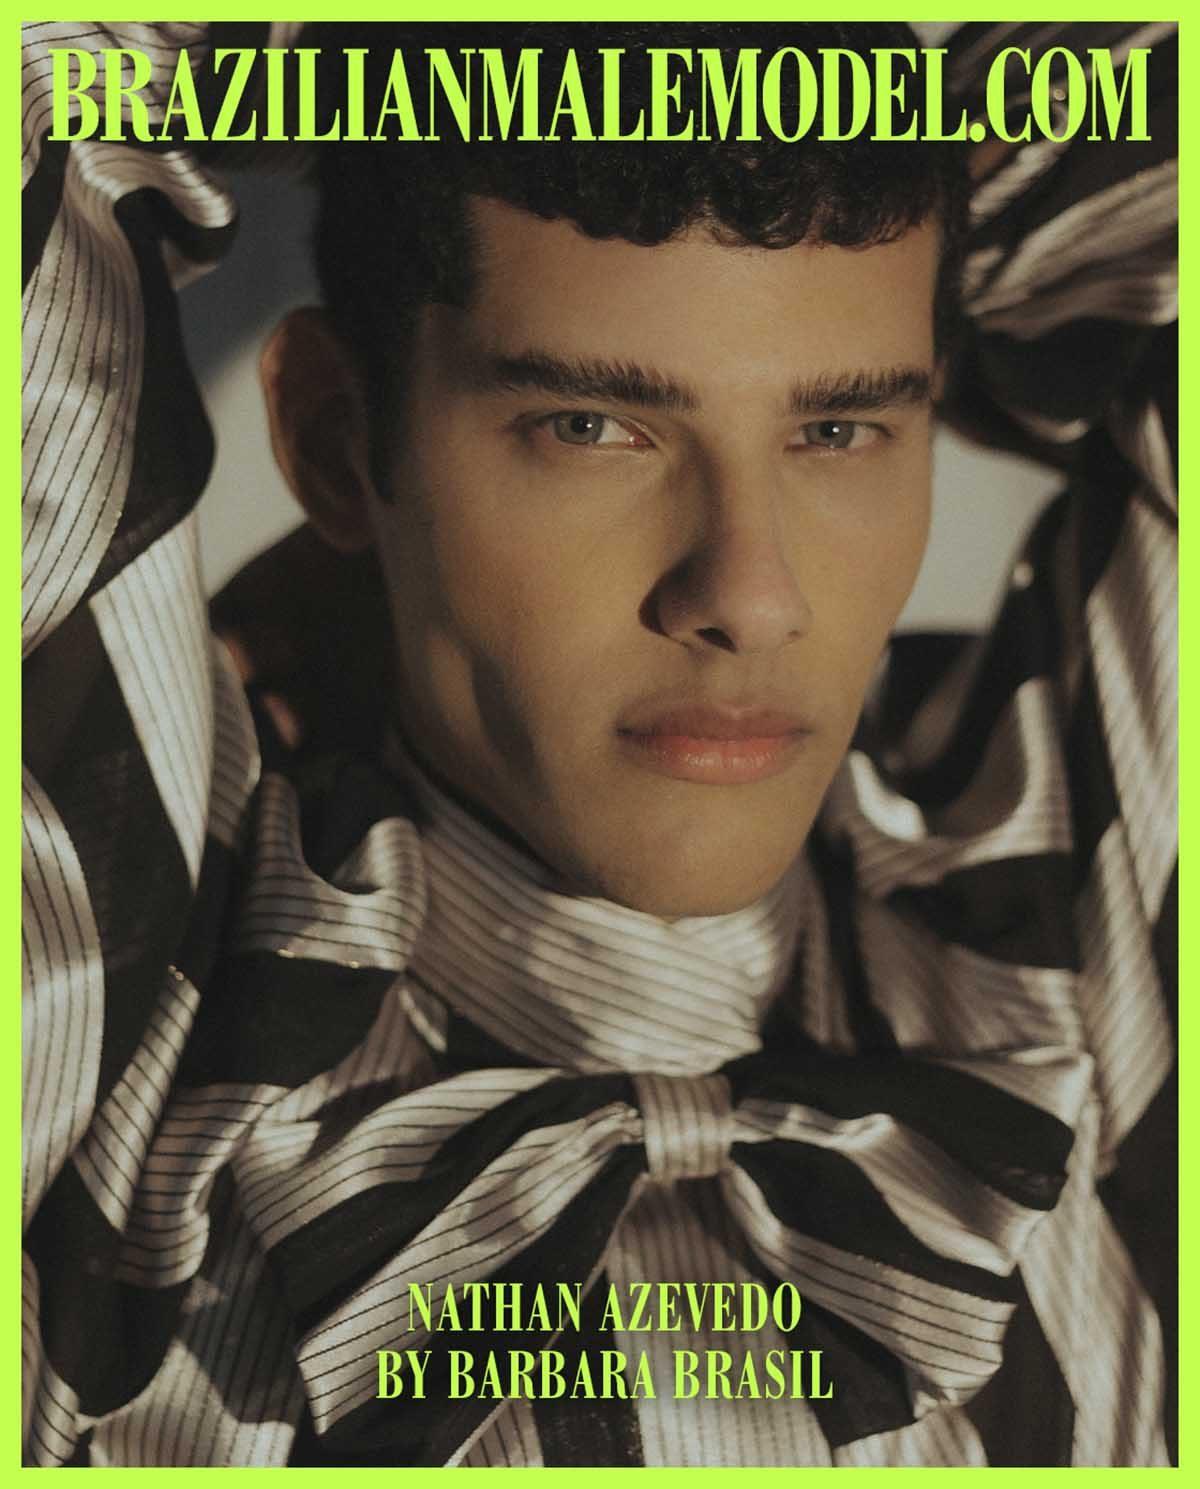 Nathan Azevedo by Barbara Brasil